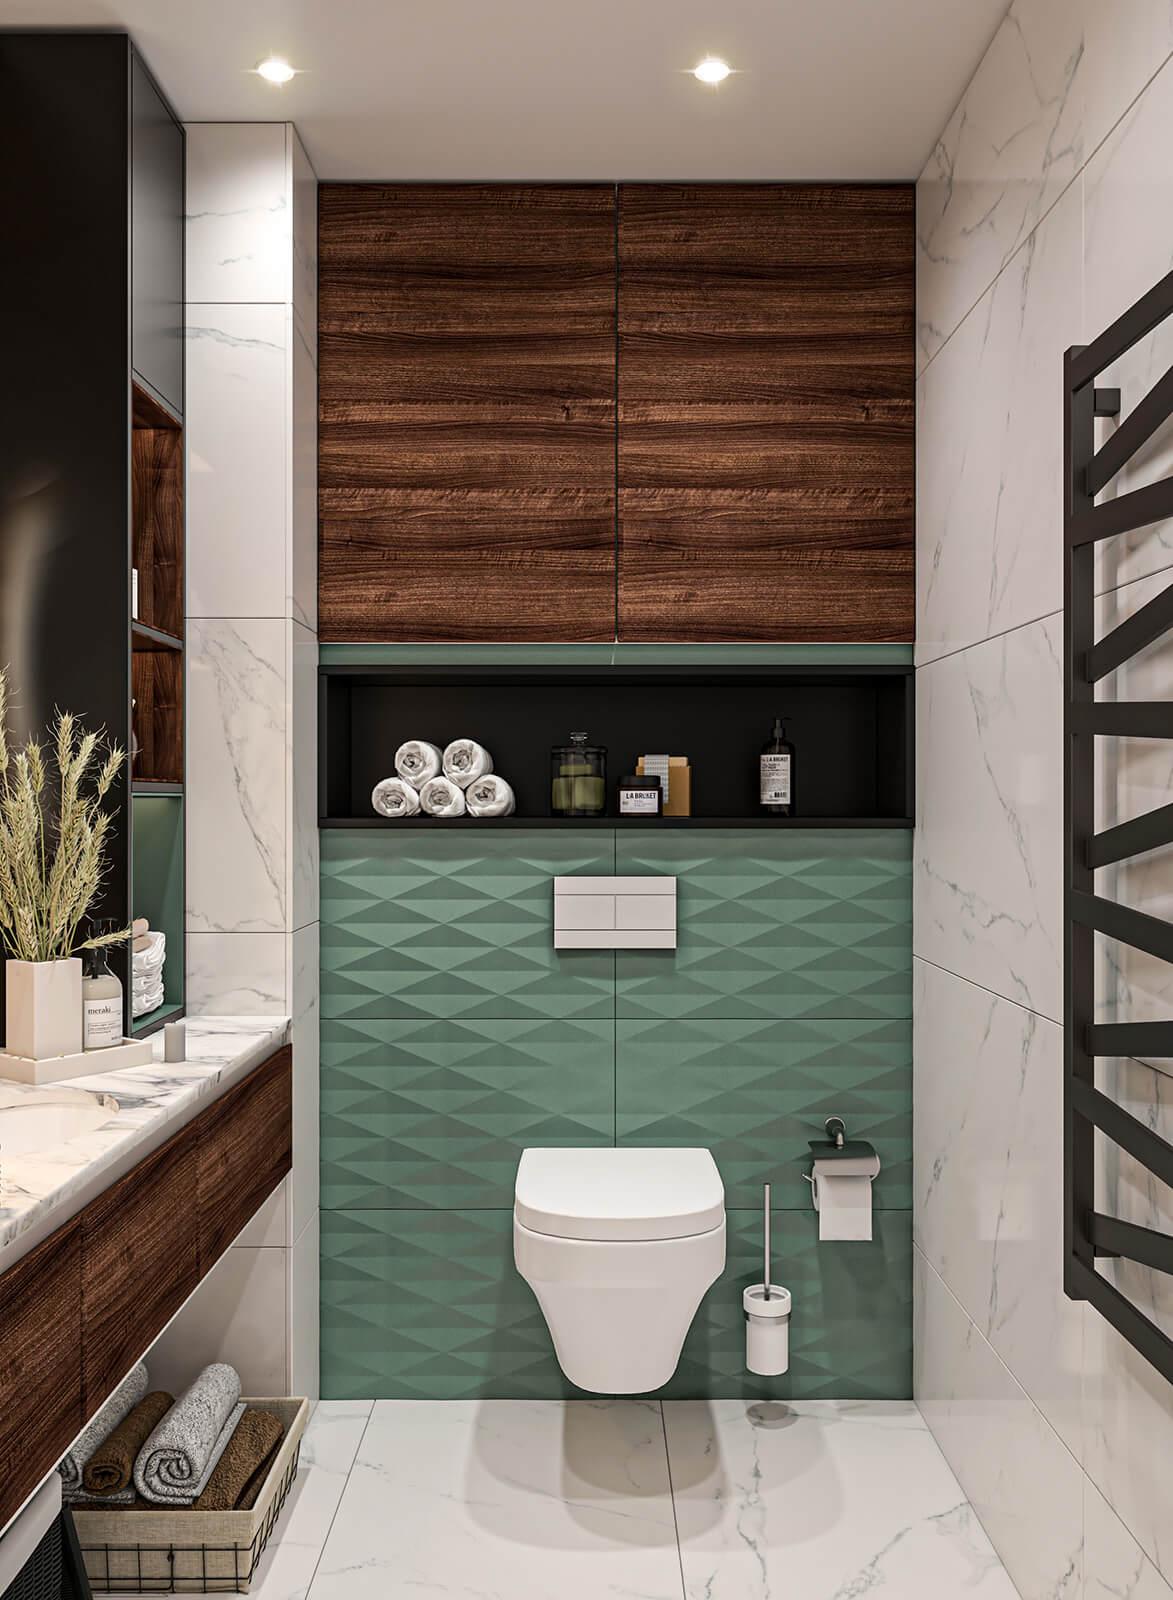 interioren-dizain-proekt-na-malka-banya-emma-2